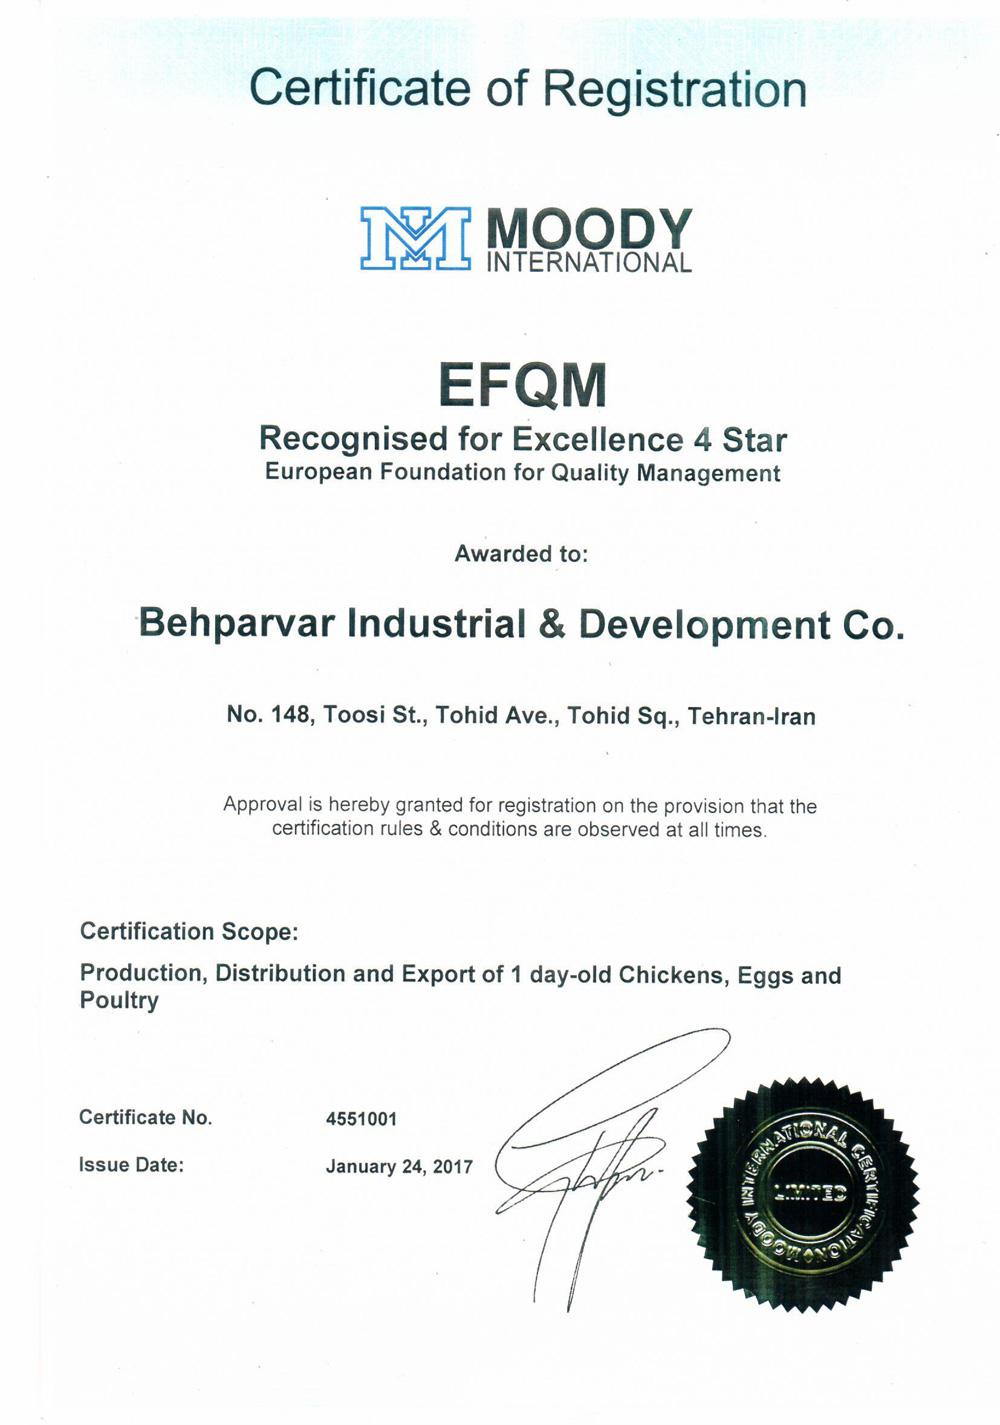 behparvararia-certification012